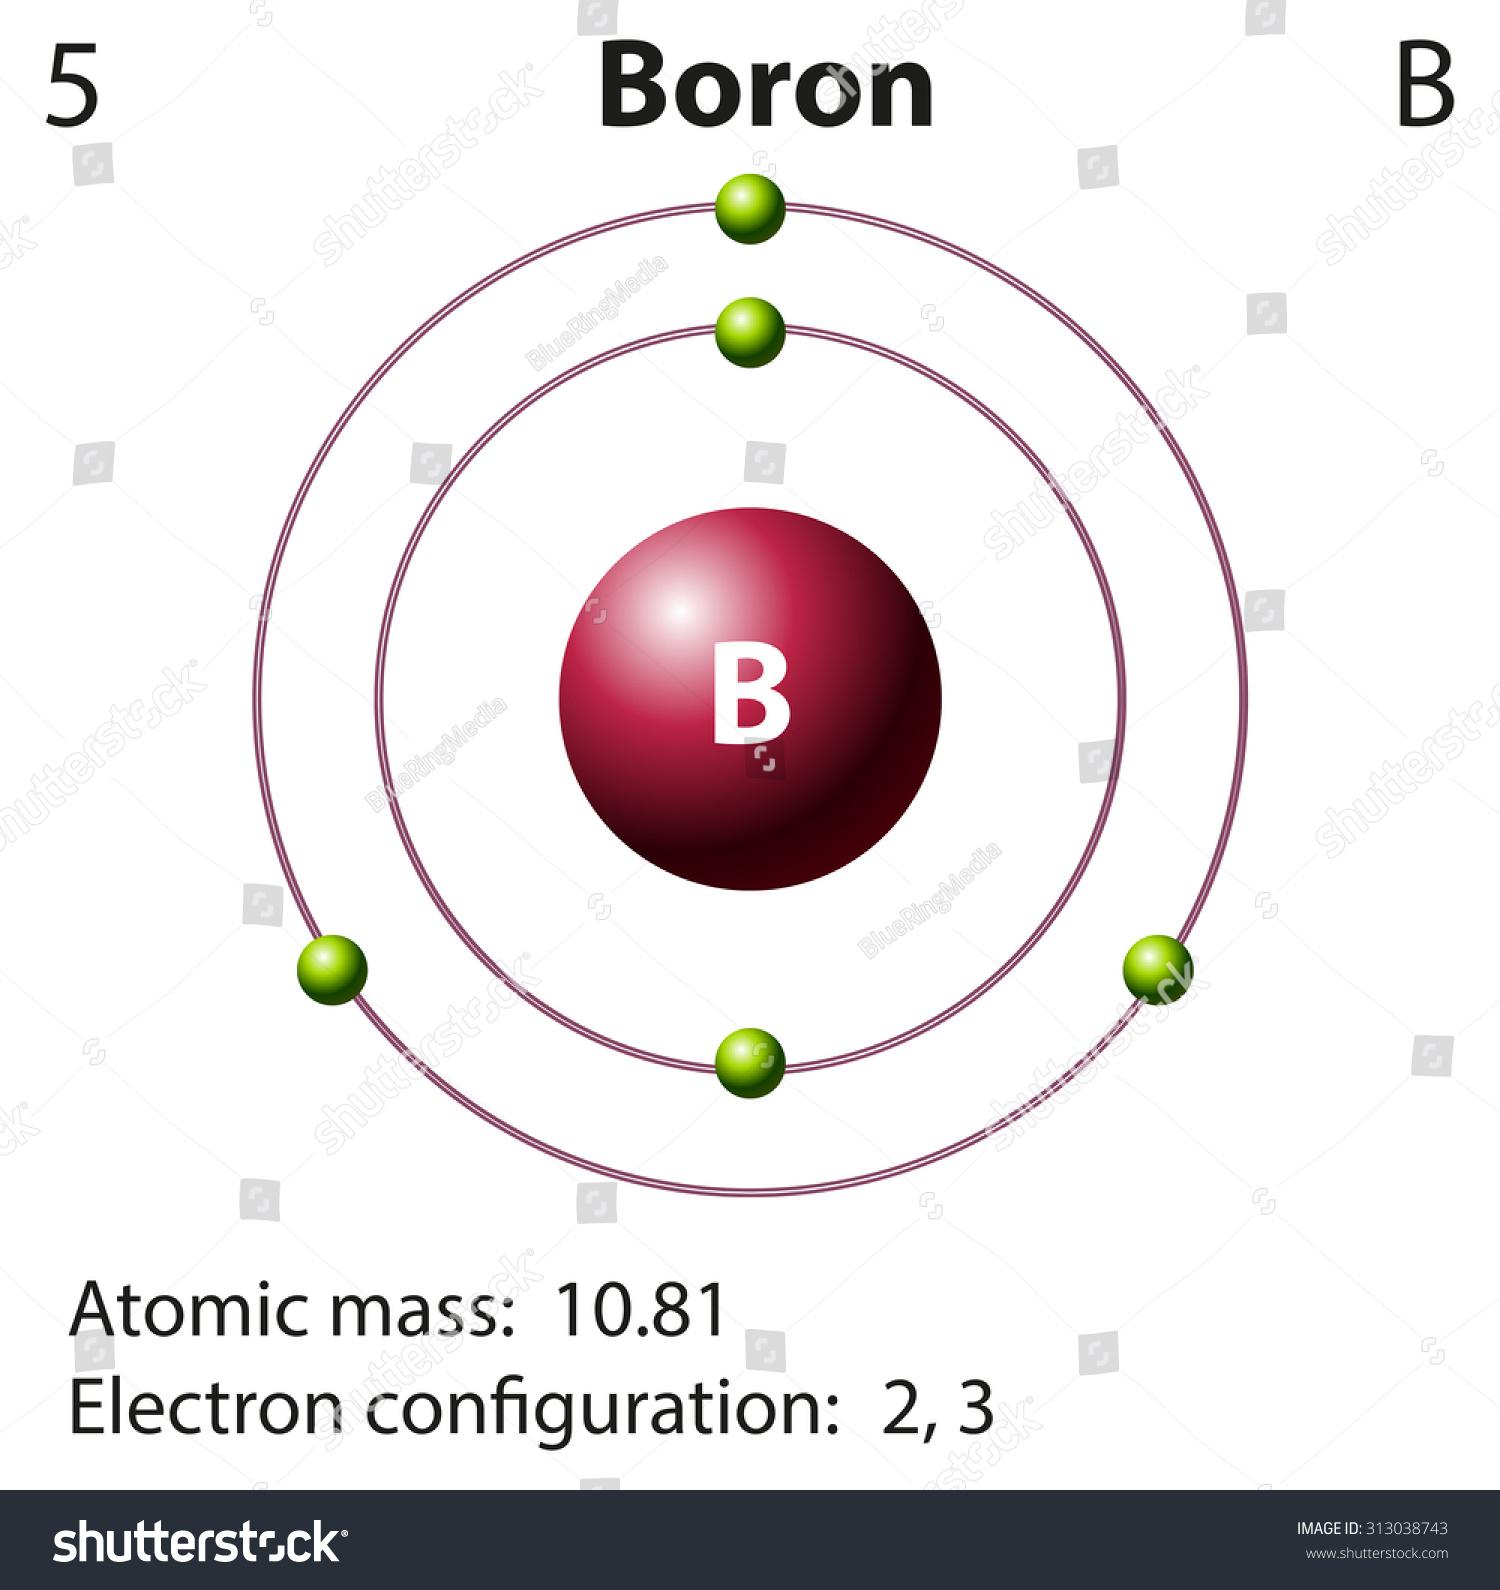 diagram representation of the element boron illustration  : boron diagram - findchart.co